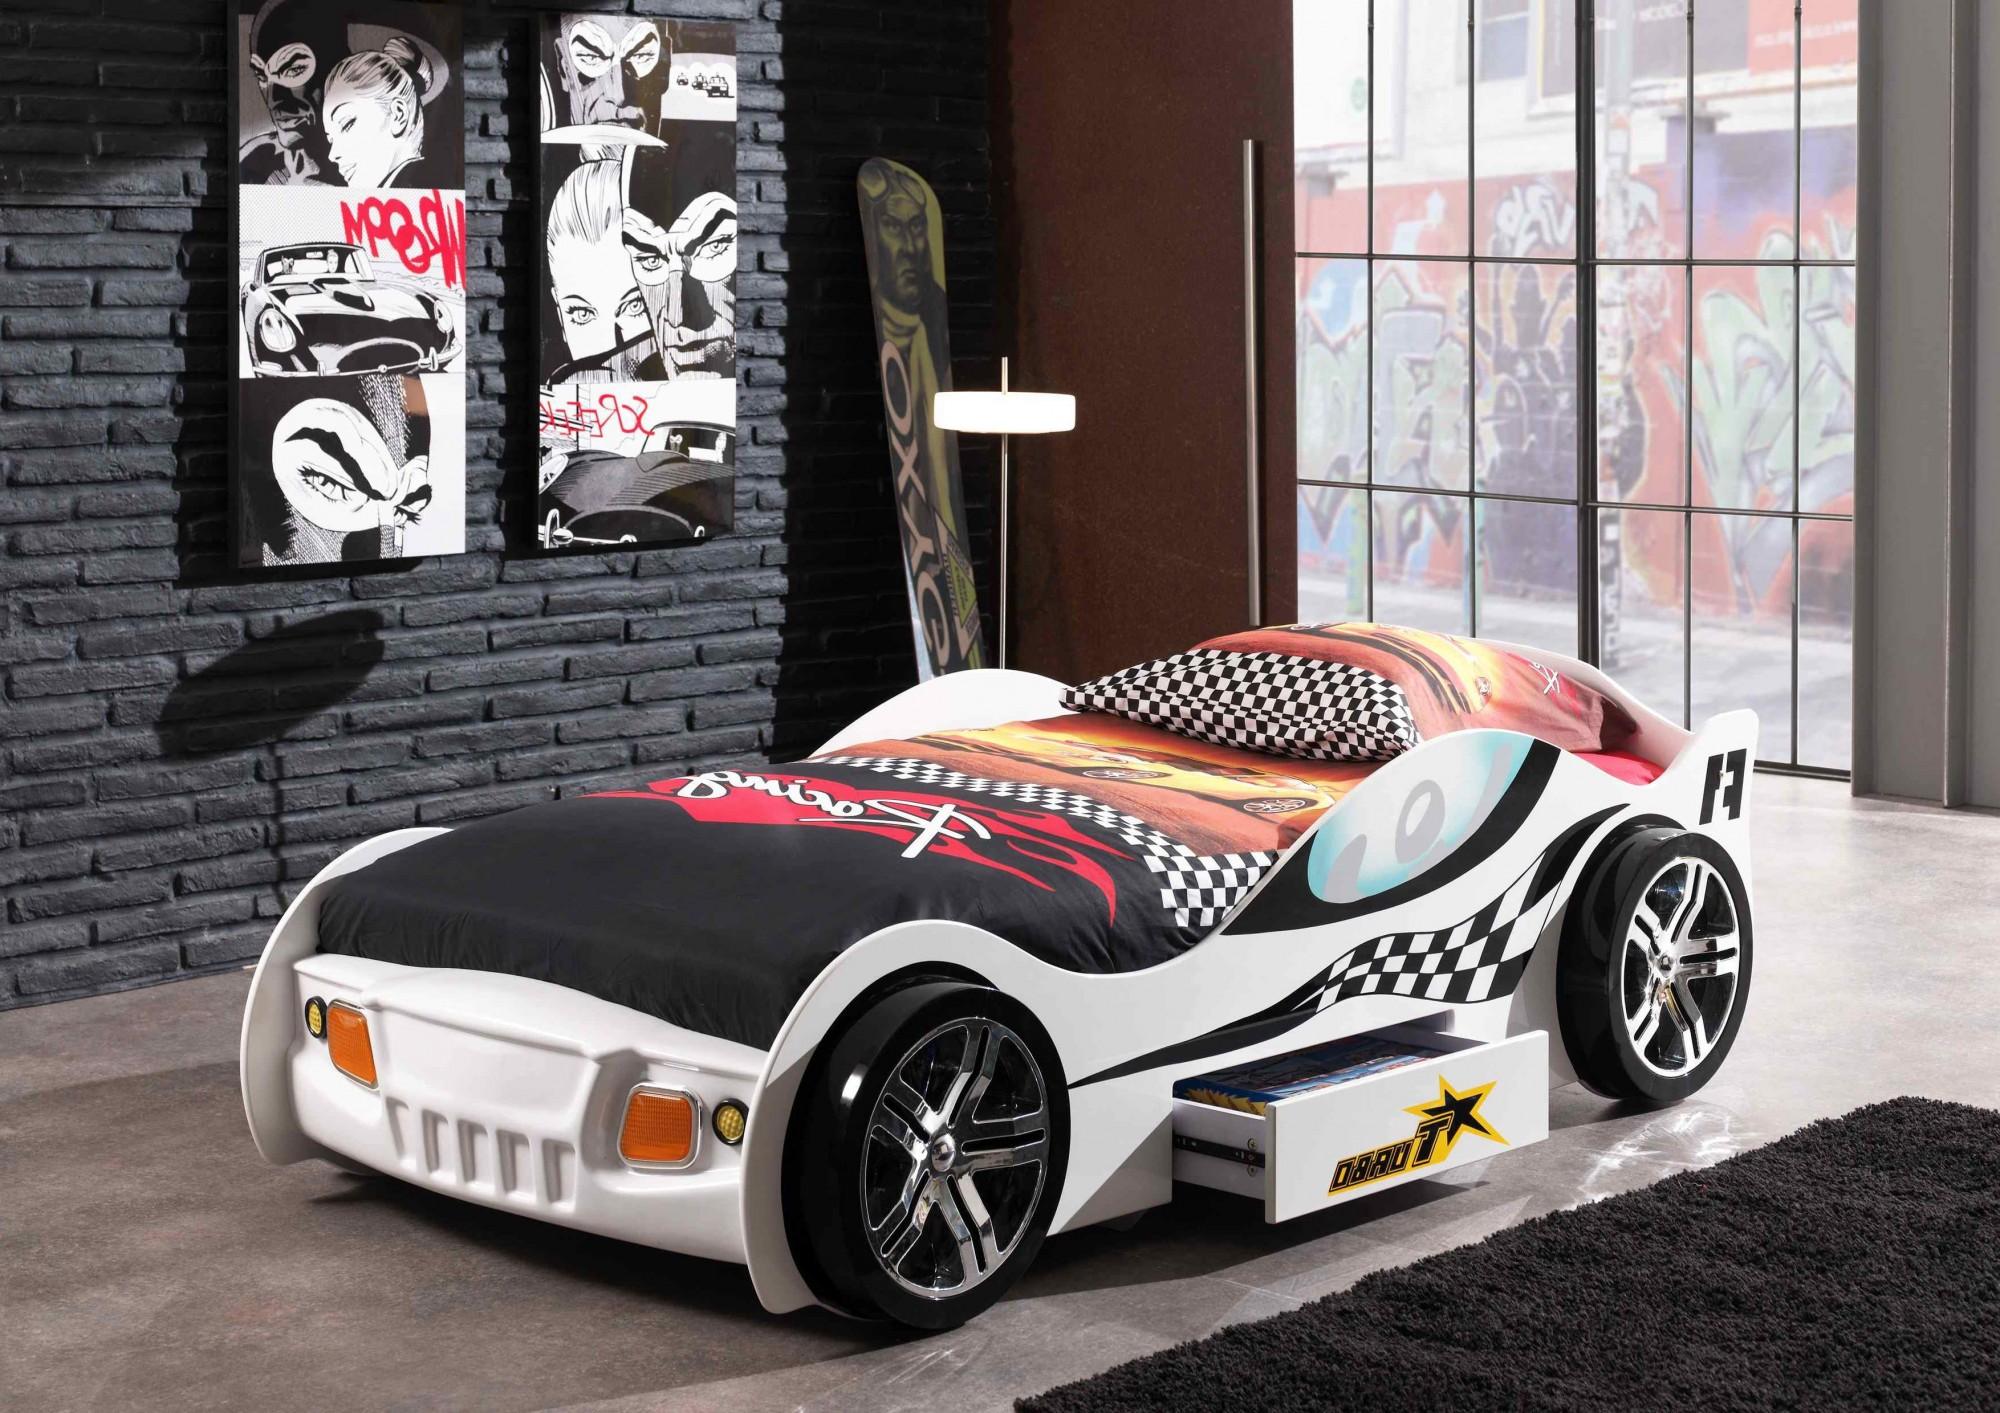 autobett turbo racing liegefl che 90 x 200 cm wei kinder jugendzimmer autobetten. Black Bedroom Furniture Sets. Home Design Ideas